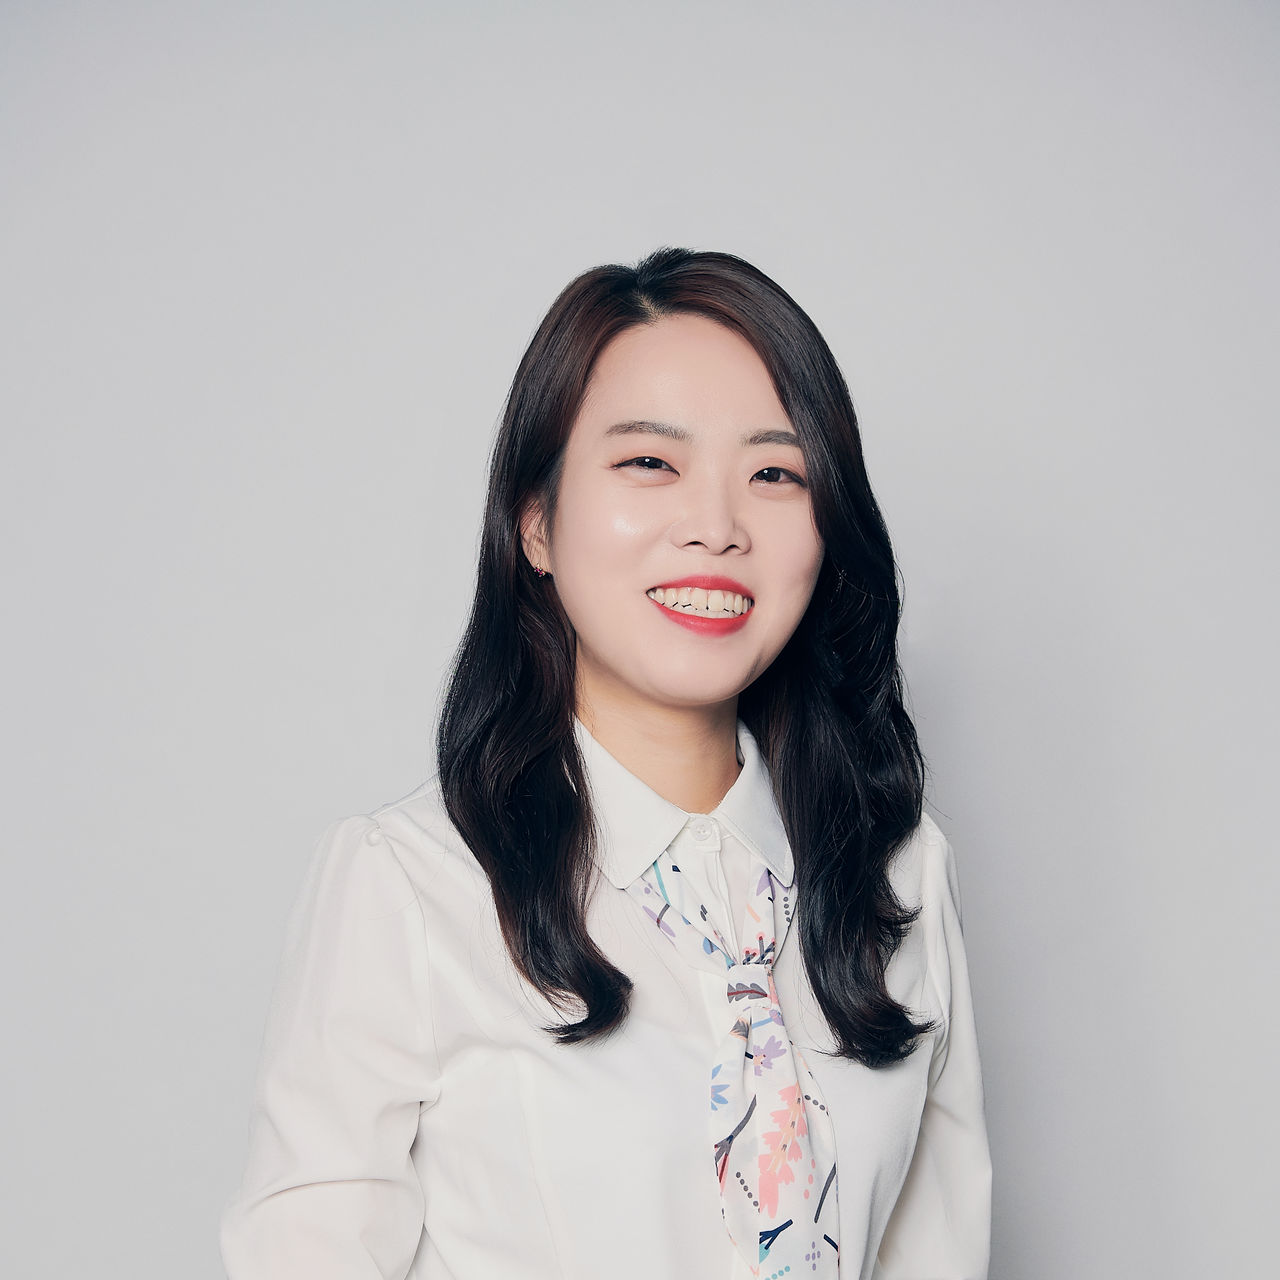 "<b>Kang Se Ra</b><br><span style=""letter-spacing: -1px; font-size: 14px; color: rgb(113, 113, 113);"">Senior Supervisor<br>"